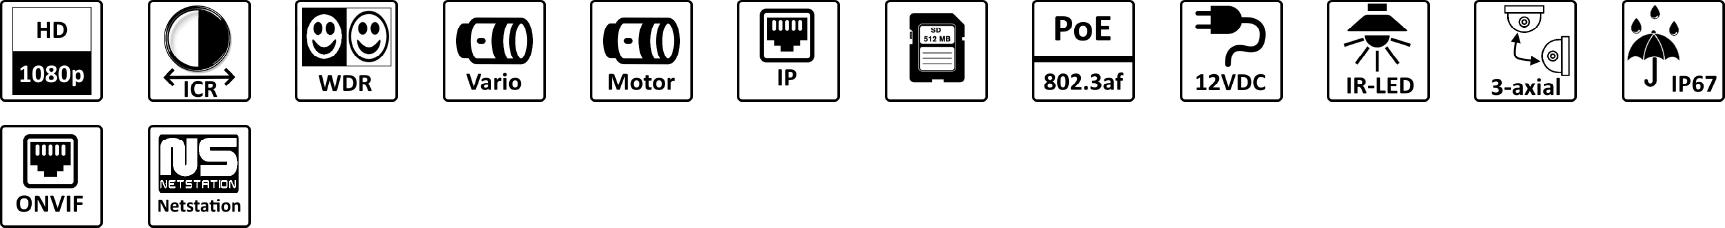 lunaIP-DL-5203_Icon